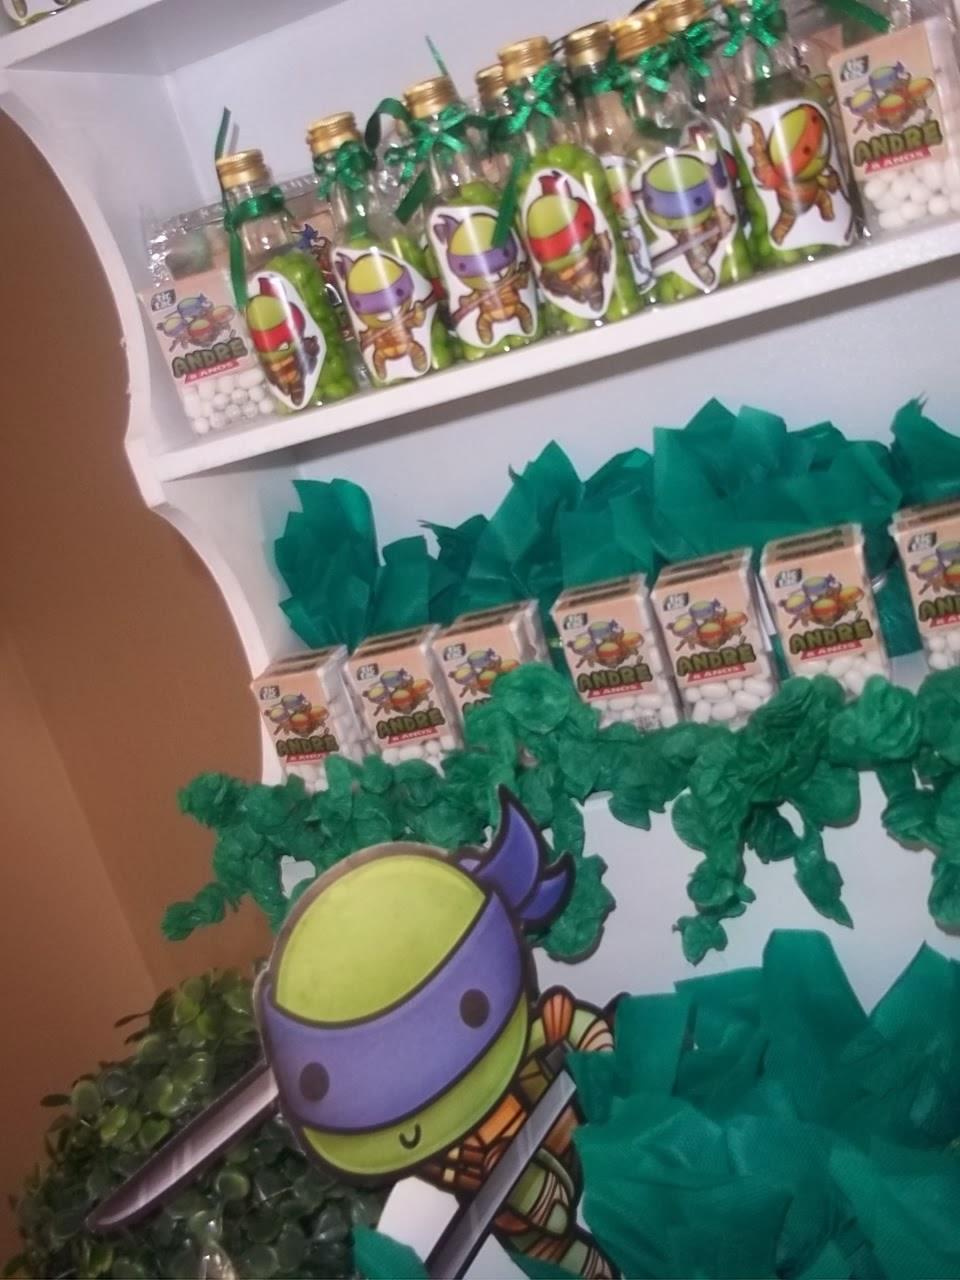 festa jardim da clarilu : festa jardim da clarilu:abá Festas: Decoração Tartarugas Ninja